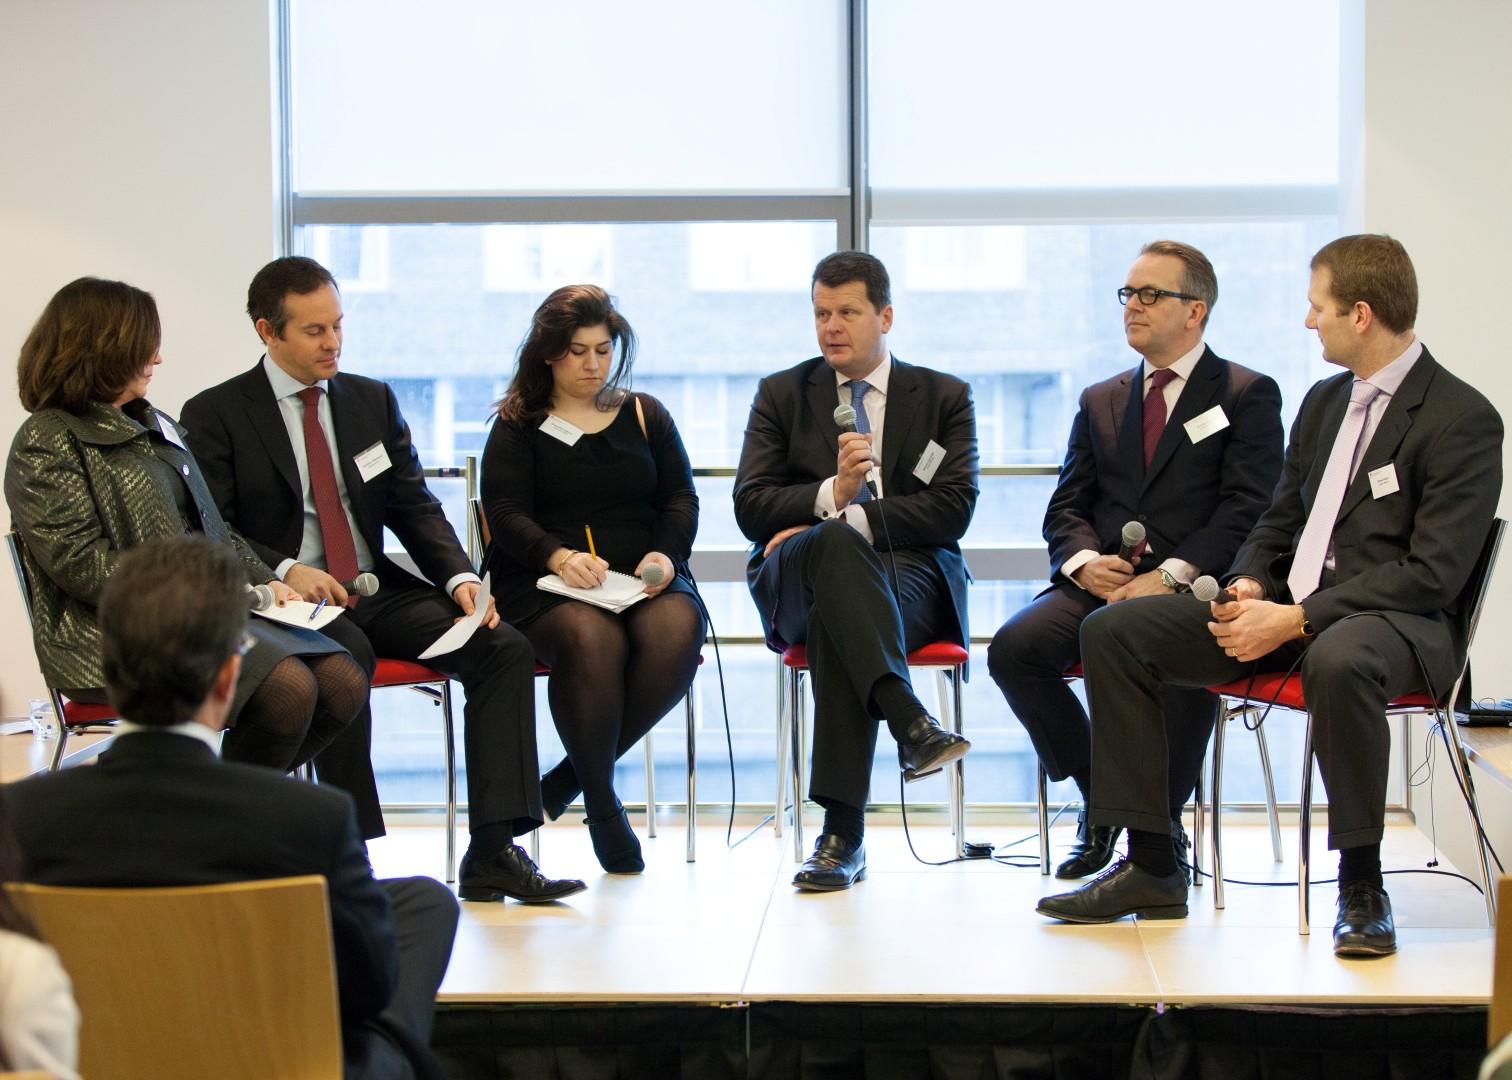 Outlook for M&A in 2013 Panel: Susan Kilsby, Hamilton Matthews, Anousha Sakoui, Stuart Upcraft, Robin Jowitt and Steve Allan